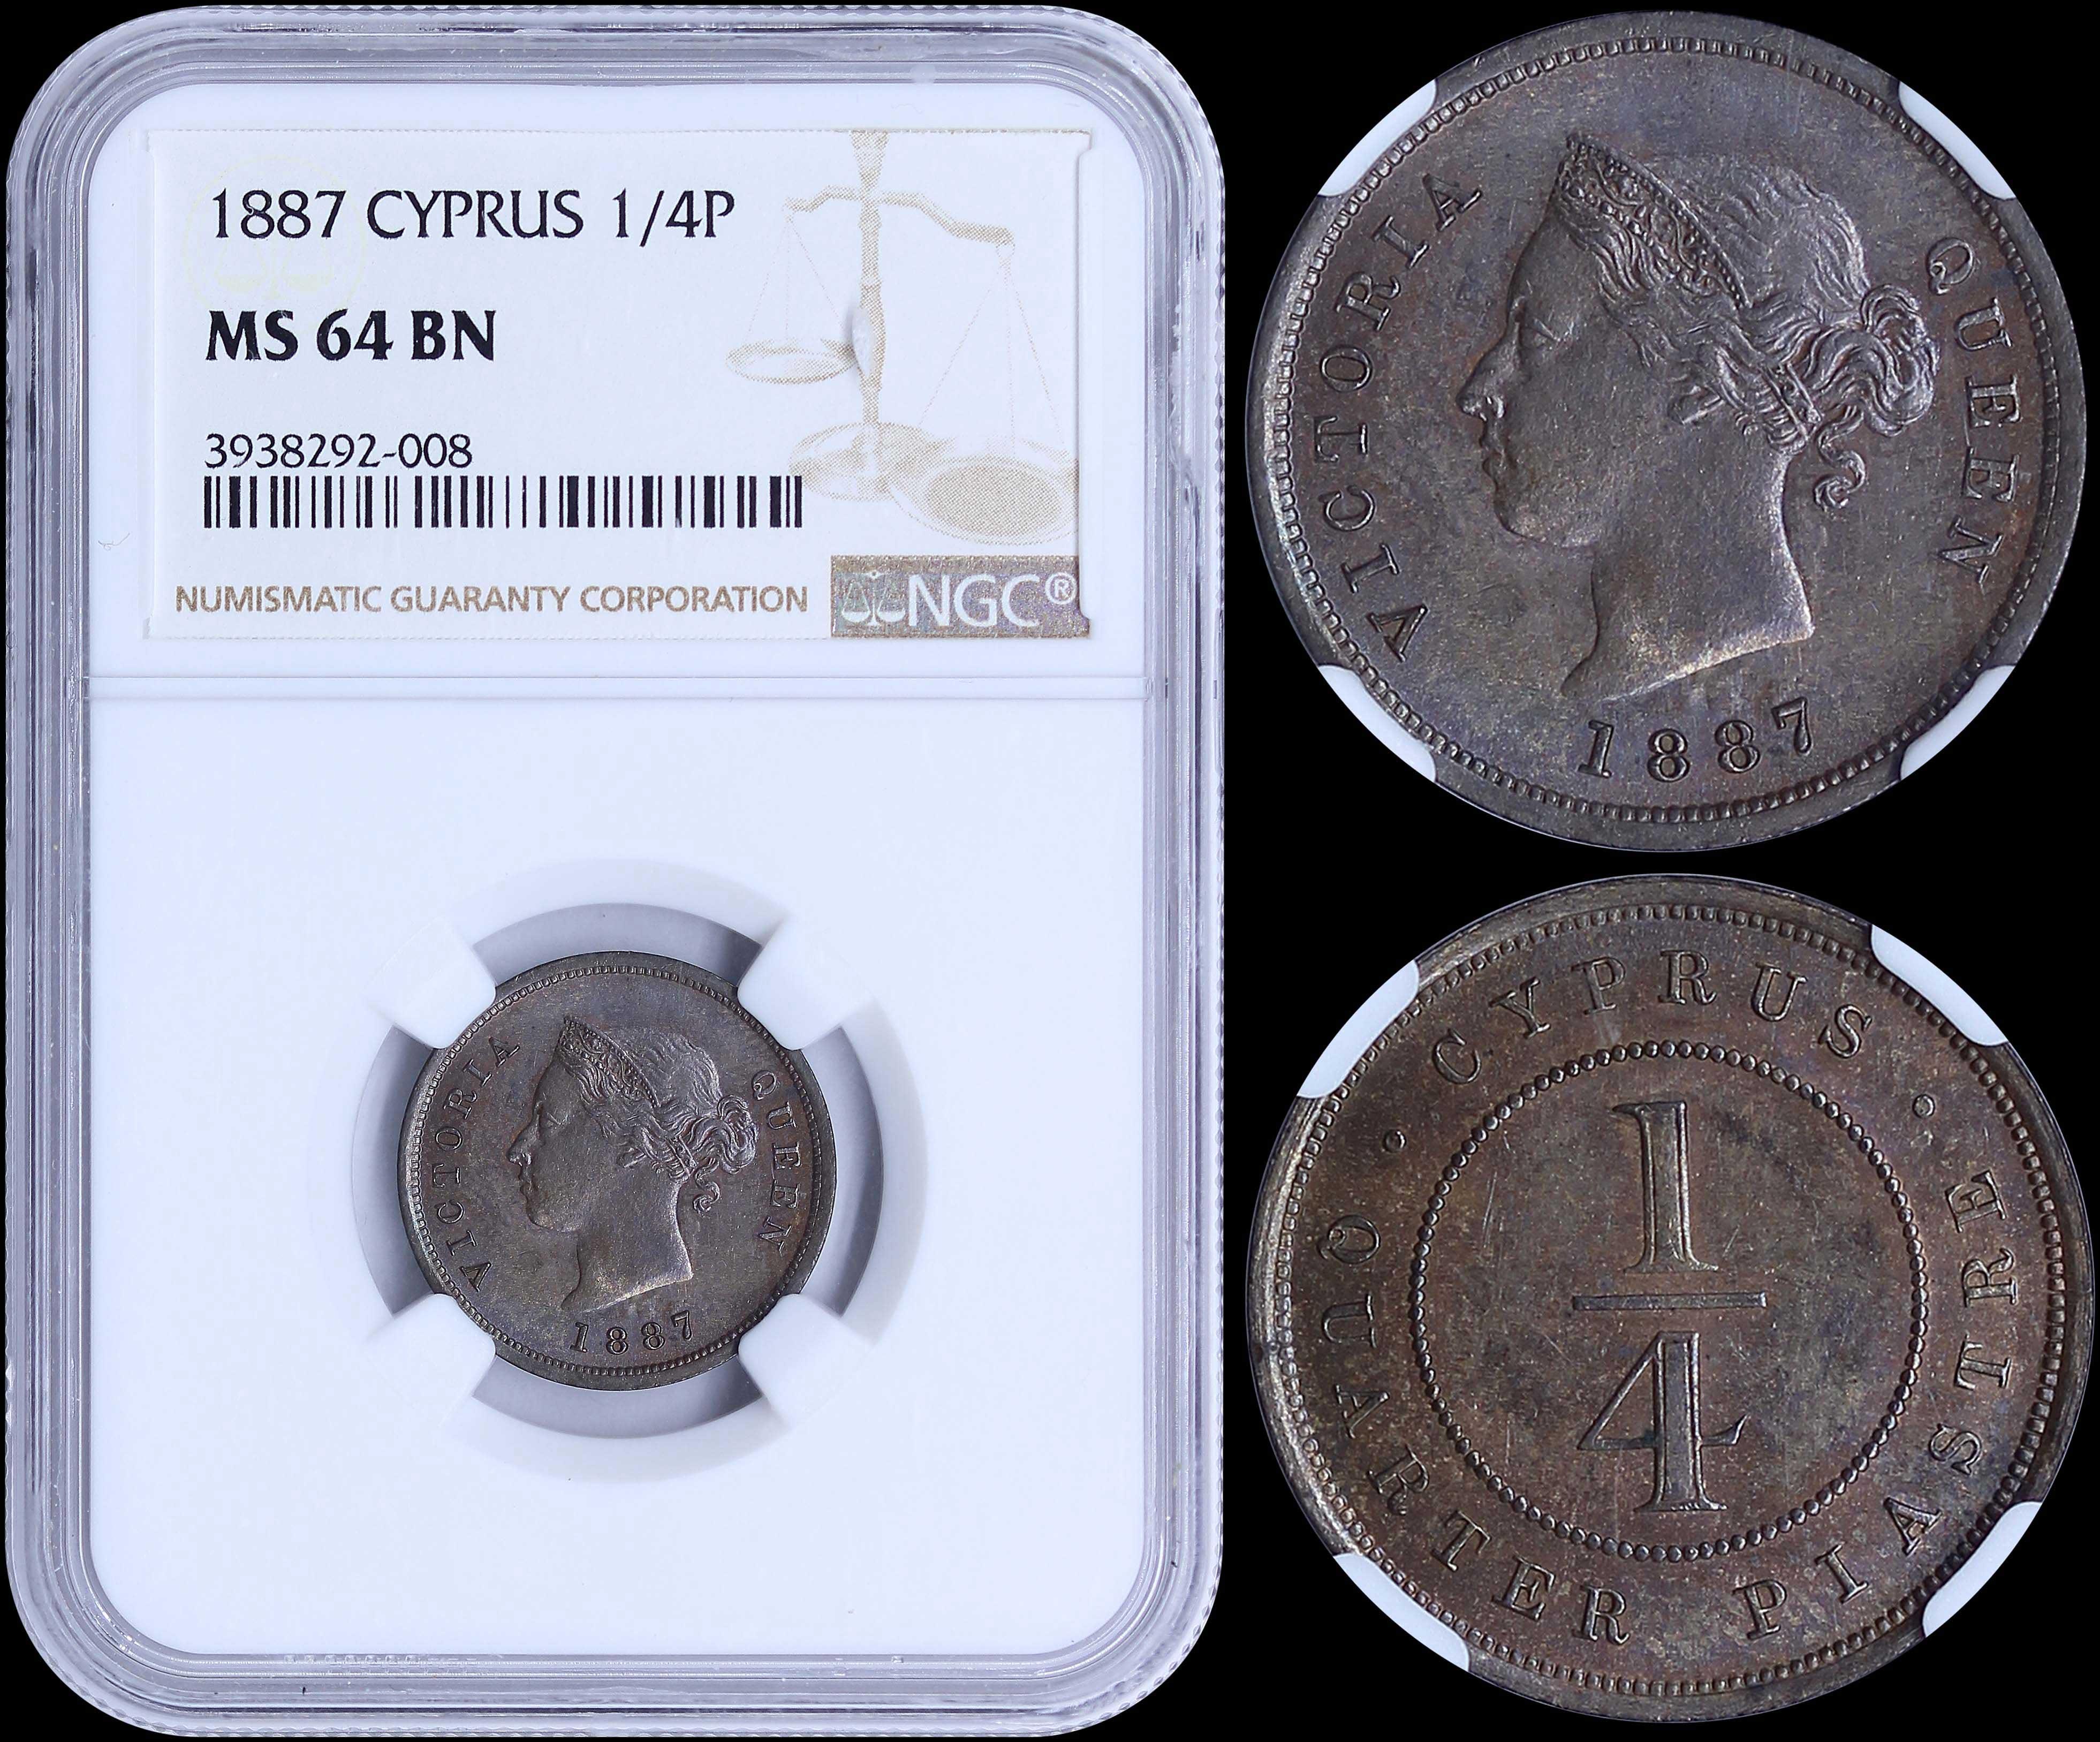 Lot 6291 - -  COINS & TOKENS Cyprus -  A. Karamitsos Public & Live Internet Auction 682 (Part A) Coins, Medals & Banknotes